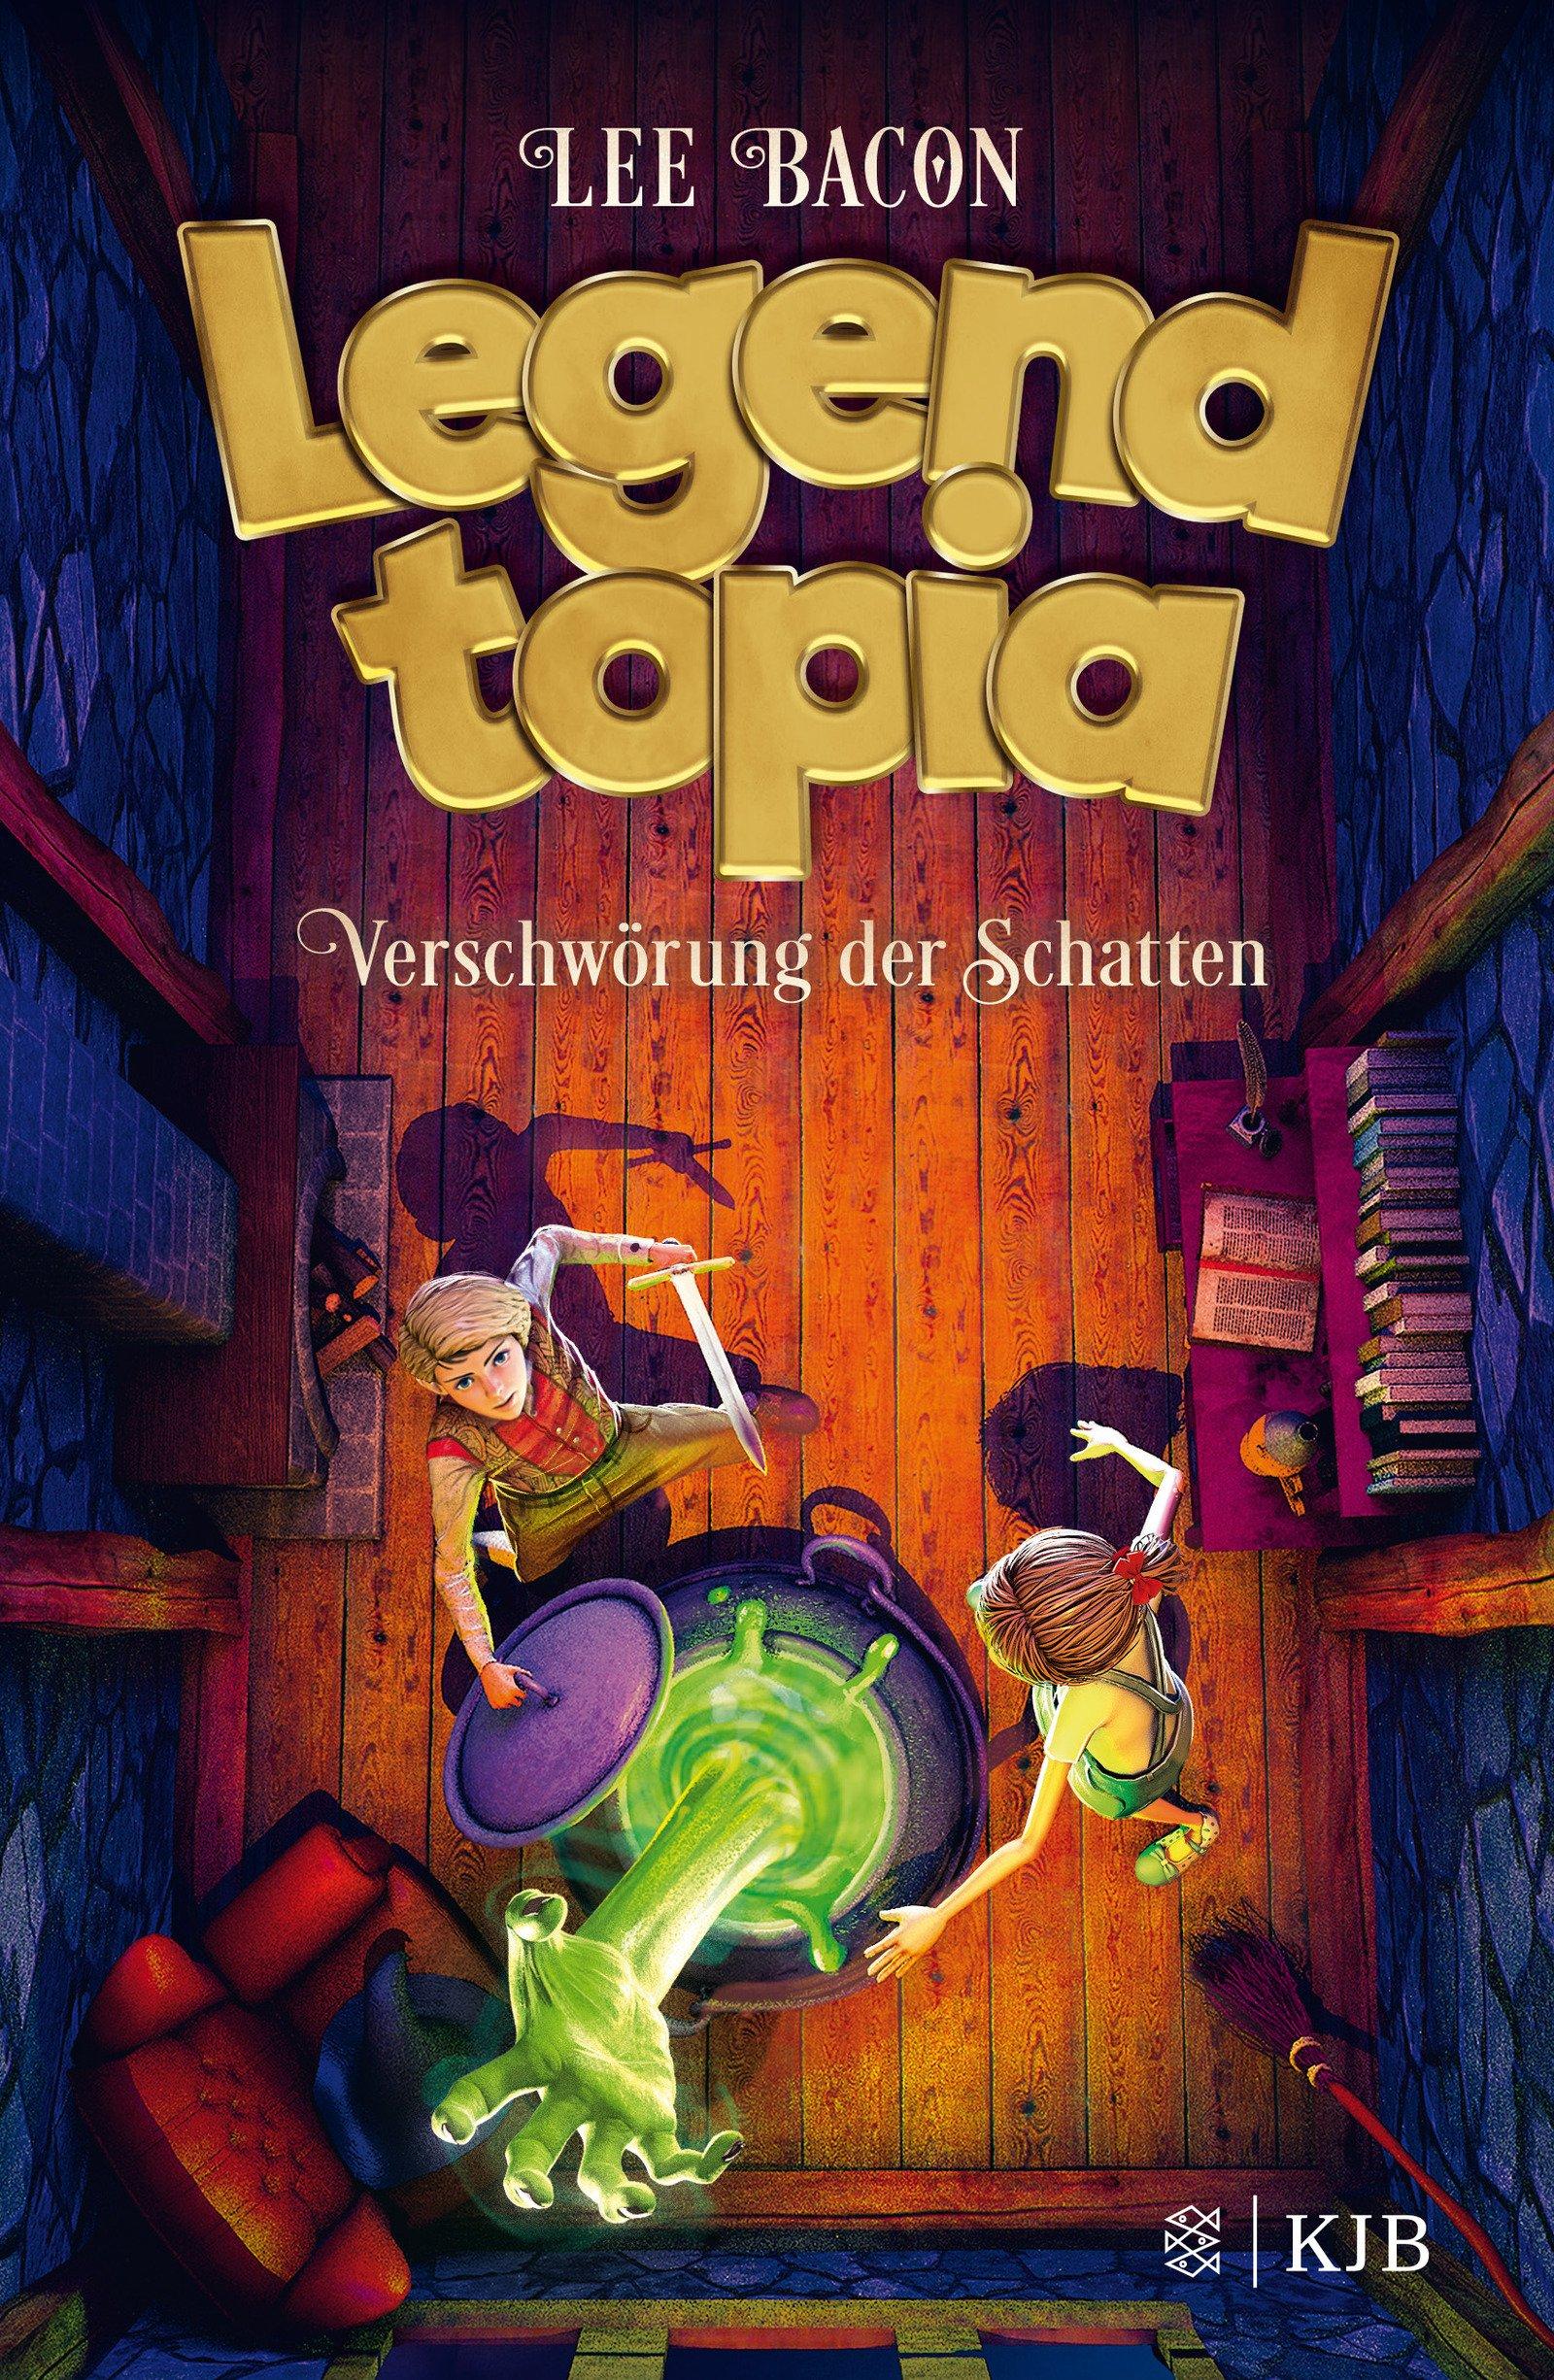 Legendtopia – Verschwörung der Schatten